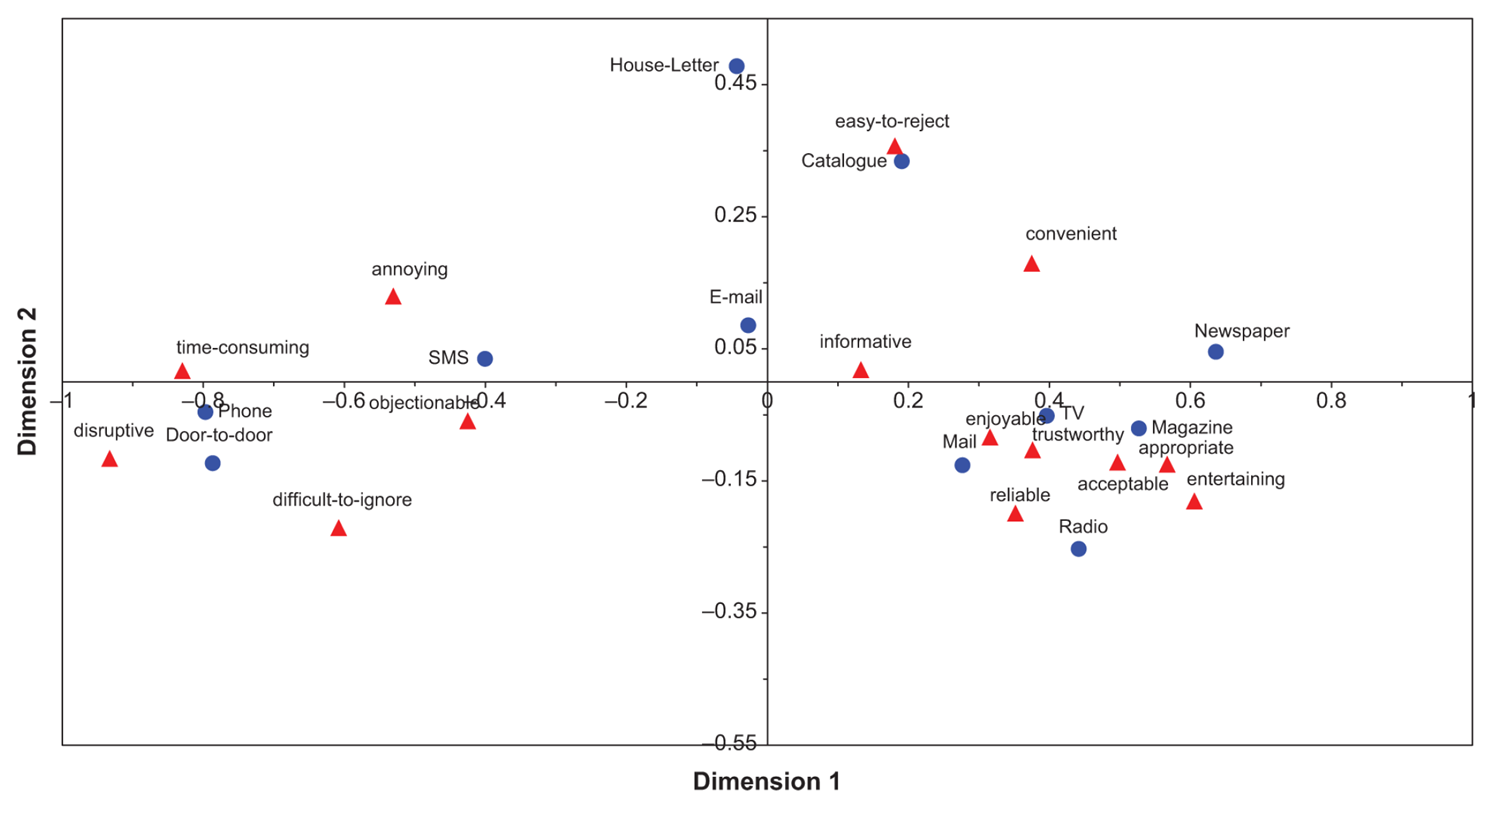 using perceptual maps in marketing simulation summary essay